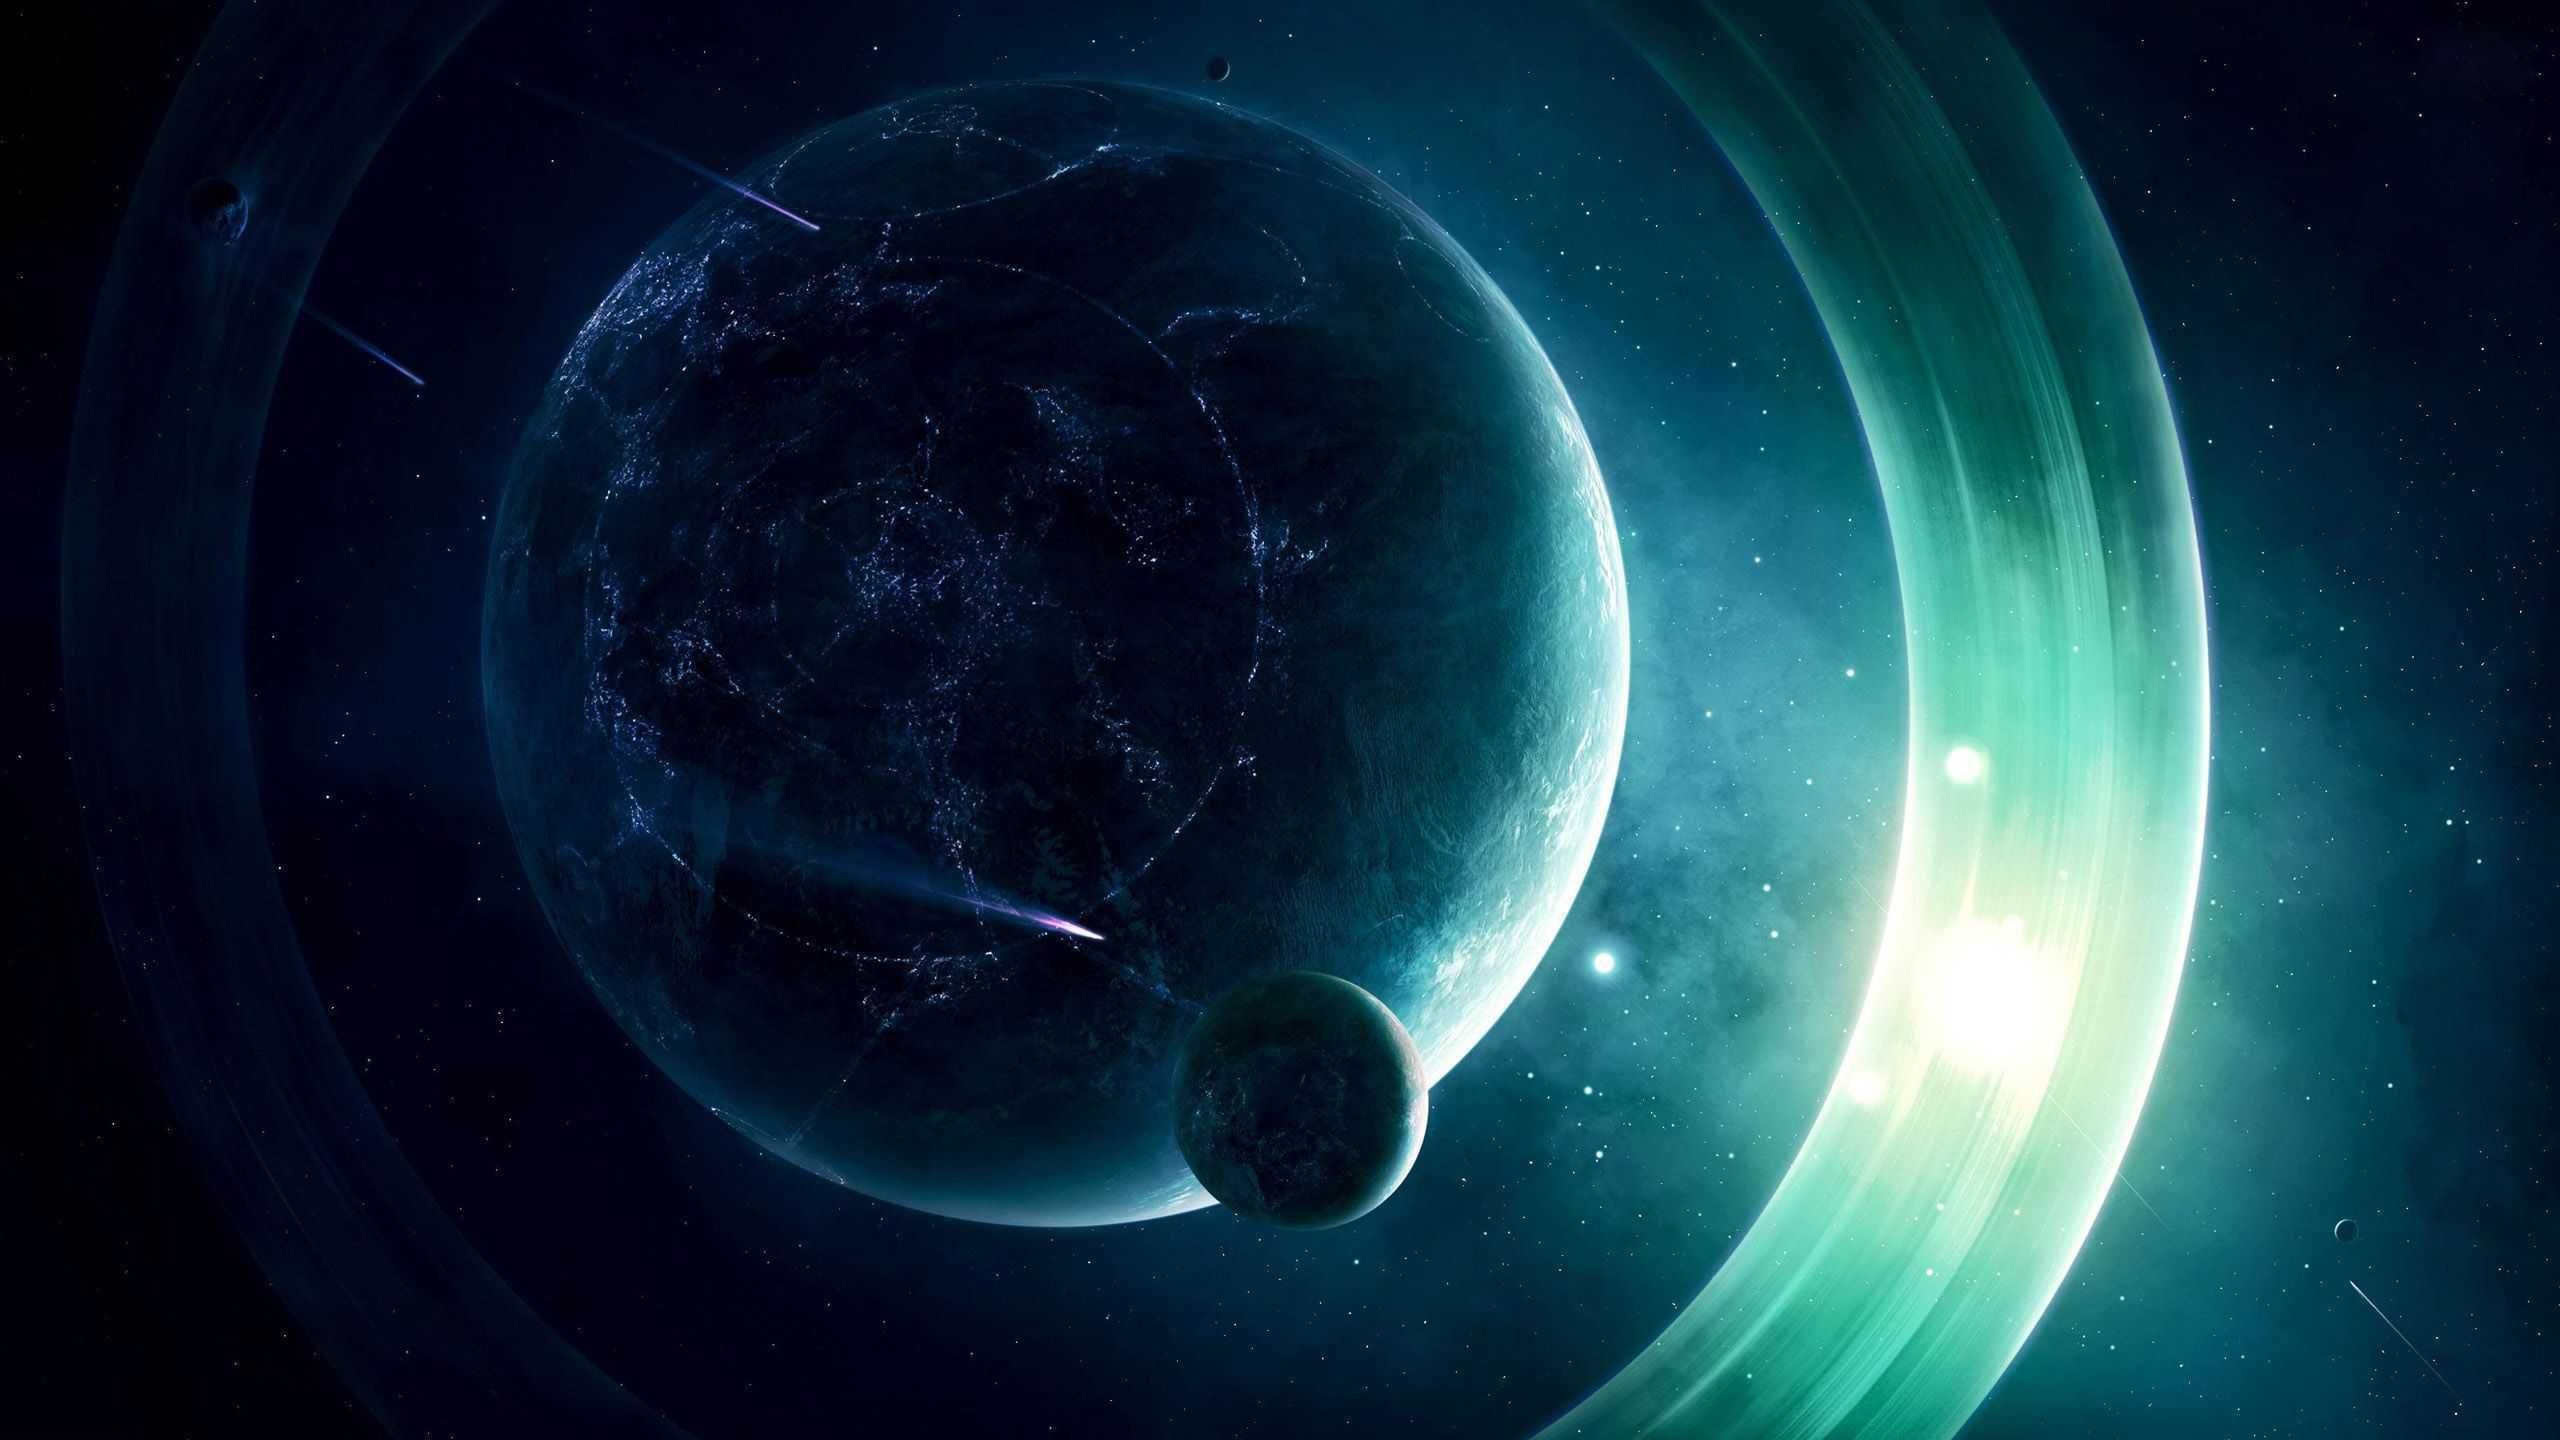 Sci Fi Wallpaper 2560x1440: Sci Fi Wallpaper 084